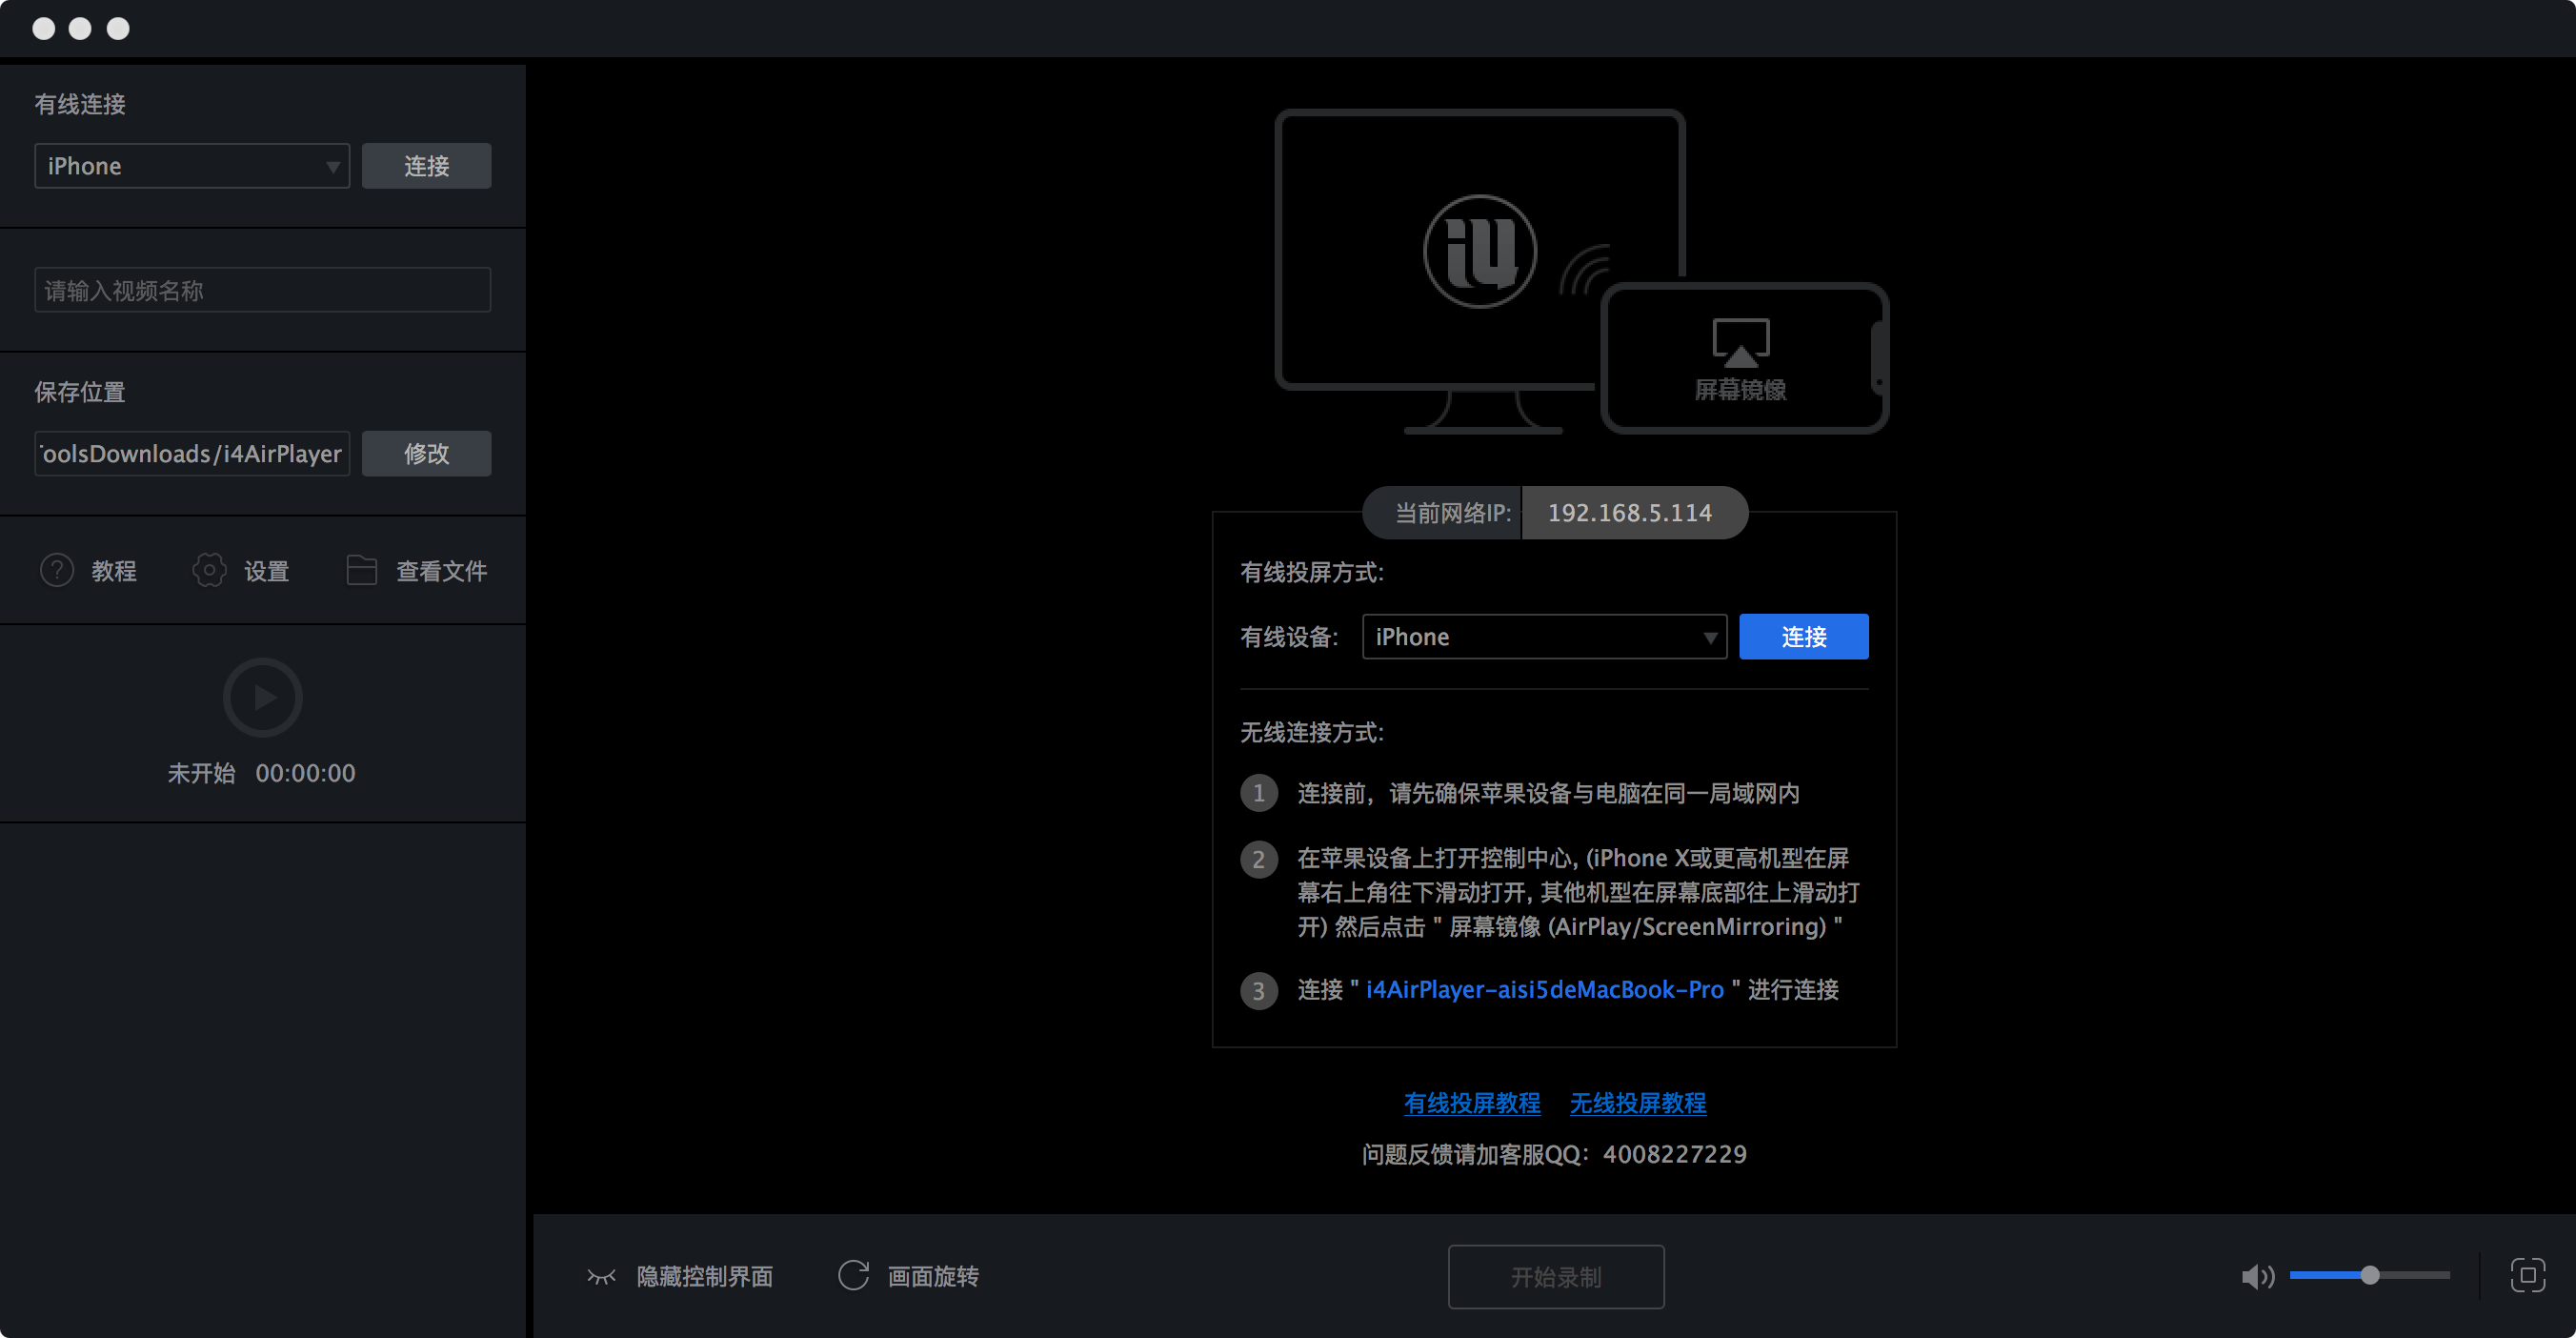 Mac版爱思助手1.03公测版:新增投屏直播/虚拟定位等重要功能